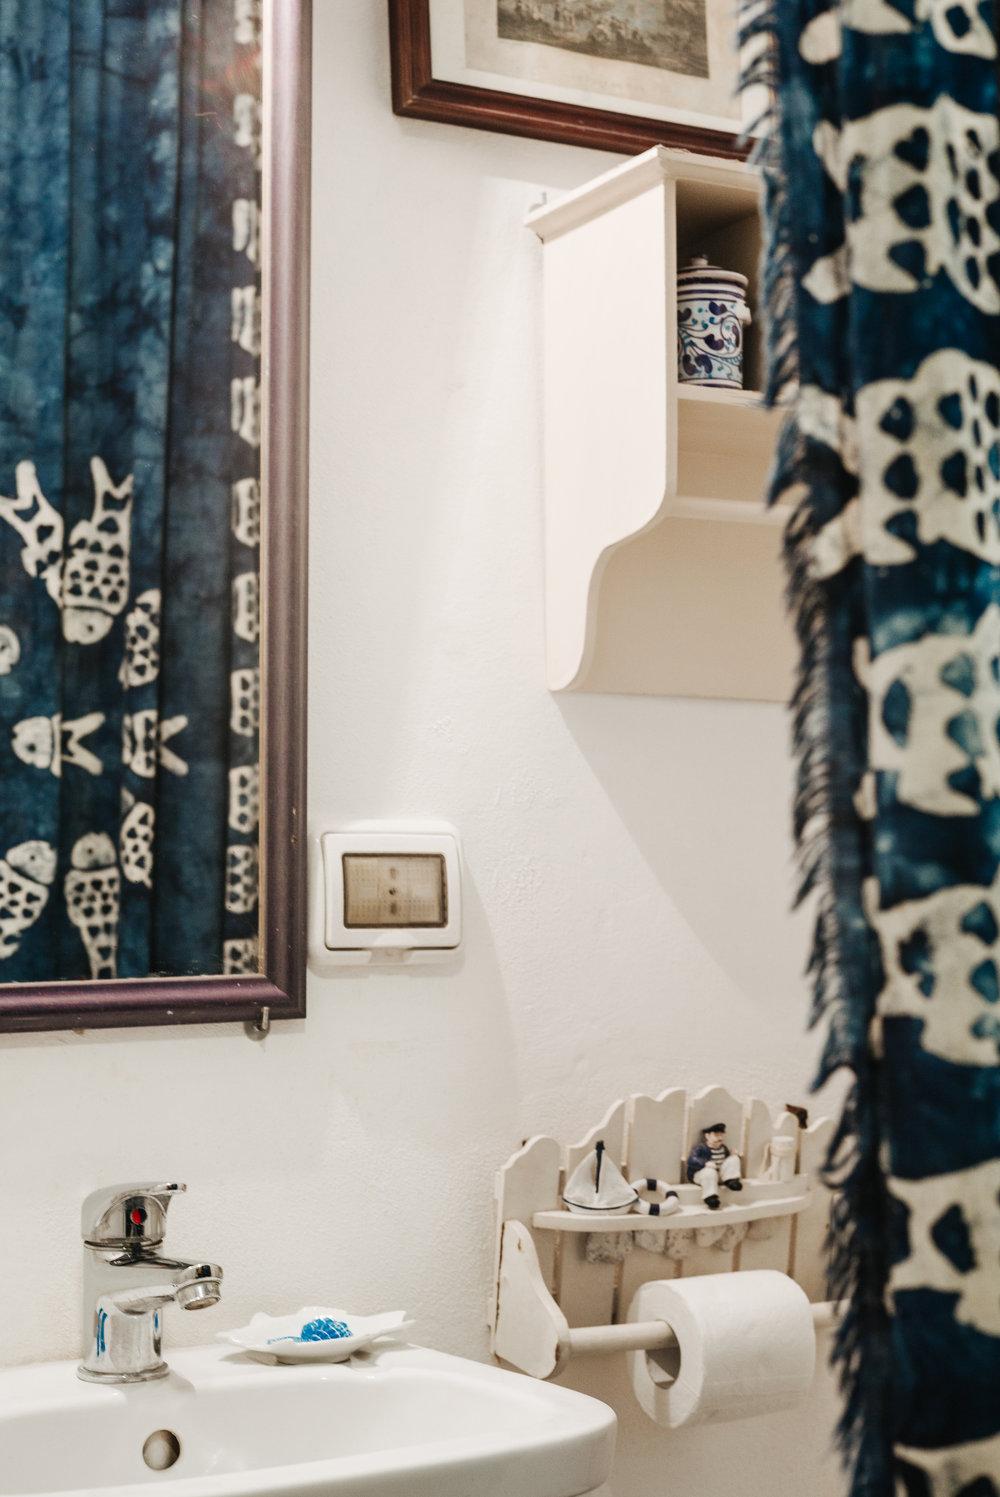 23sampieri-casa-vacanze-sicilia-appartamento-sicily-holiday-apartment-casazzurra-italia-italy.jpg